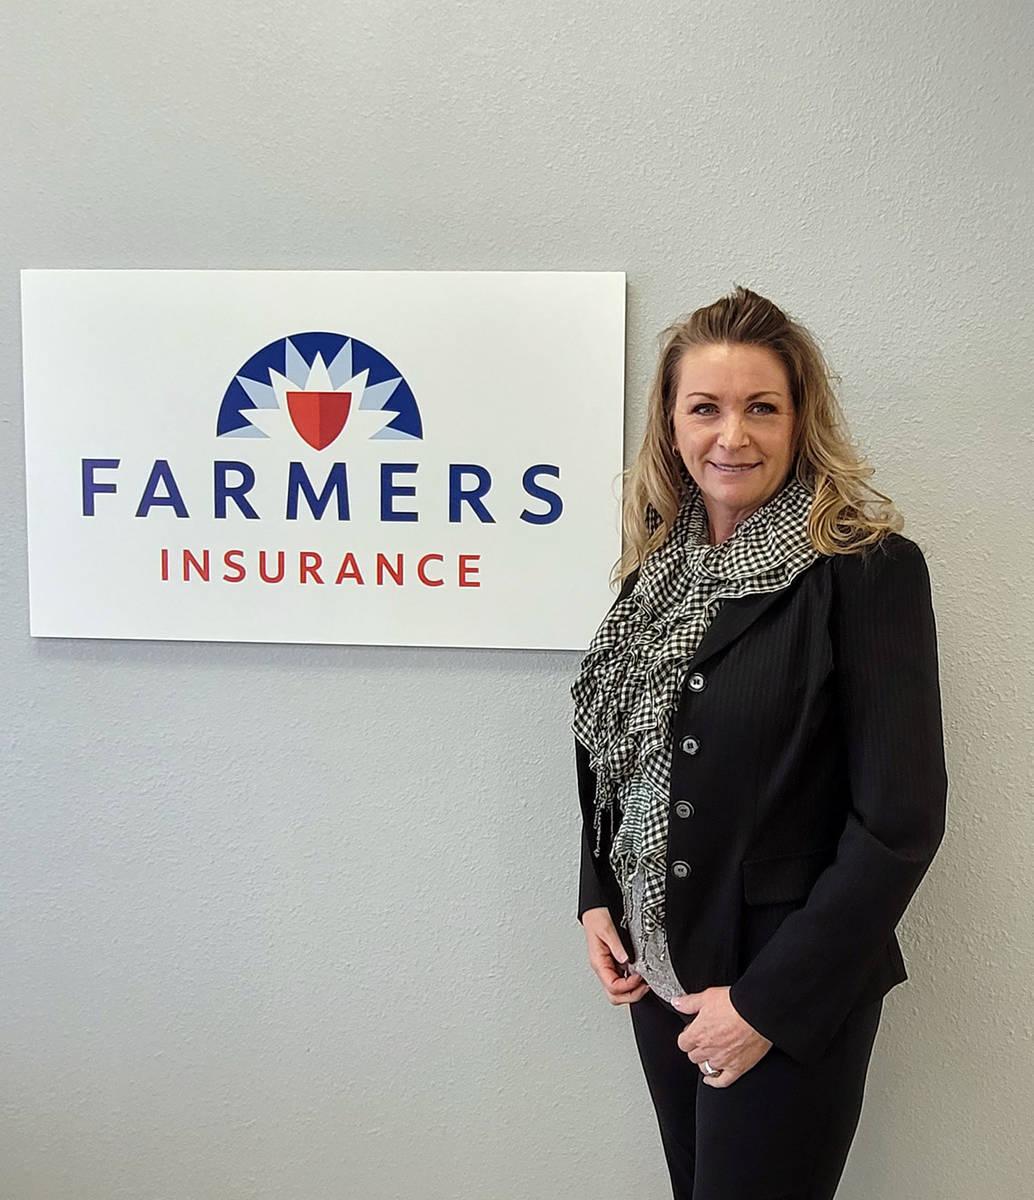 Celia Shortt Goodyear/Boulder City Review Dawn Lee recently opened a Farmers Insurance Agency b ...